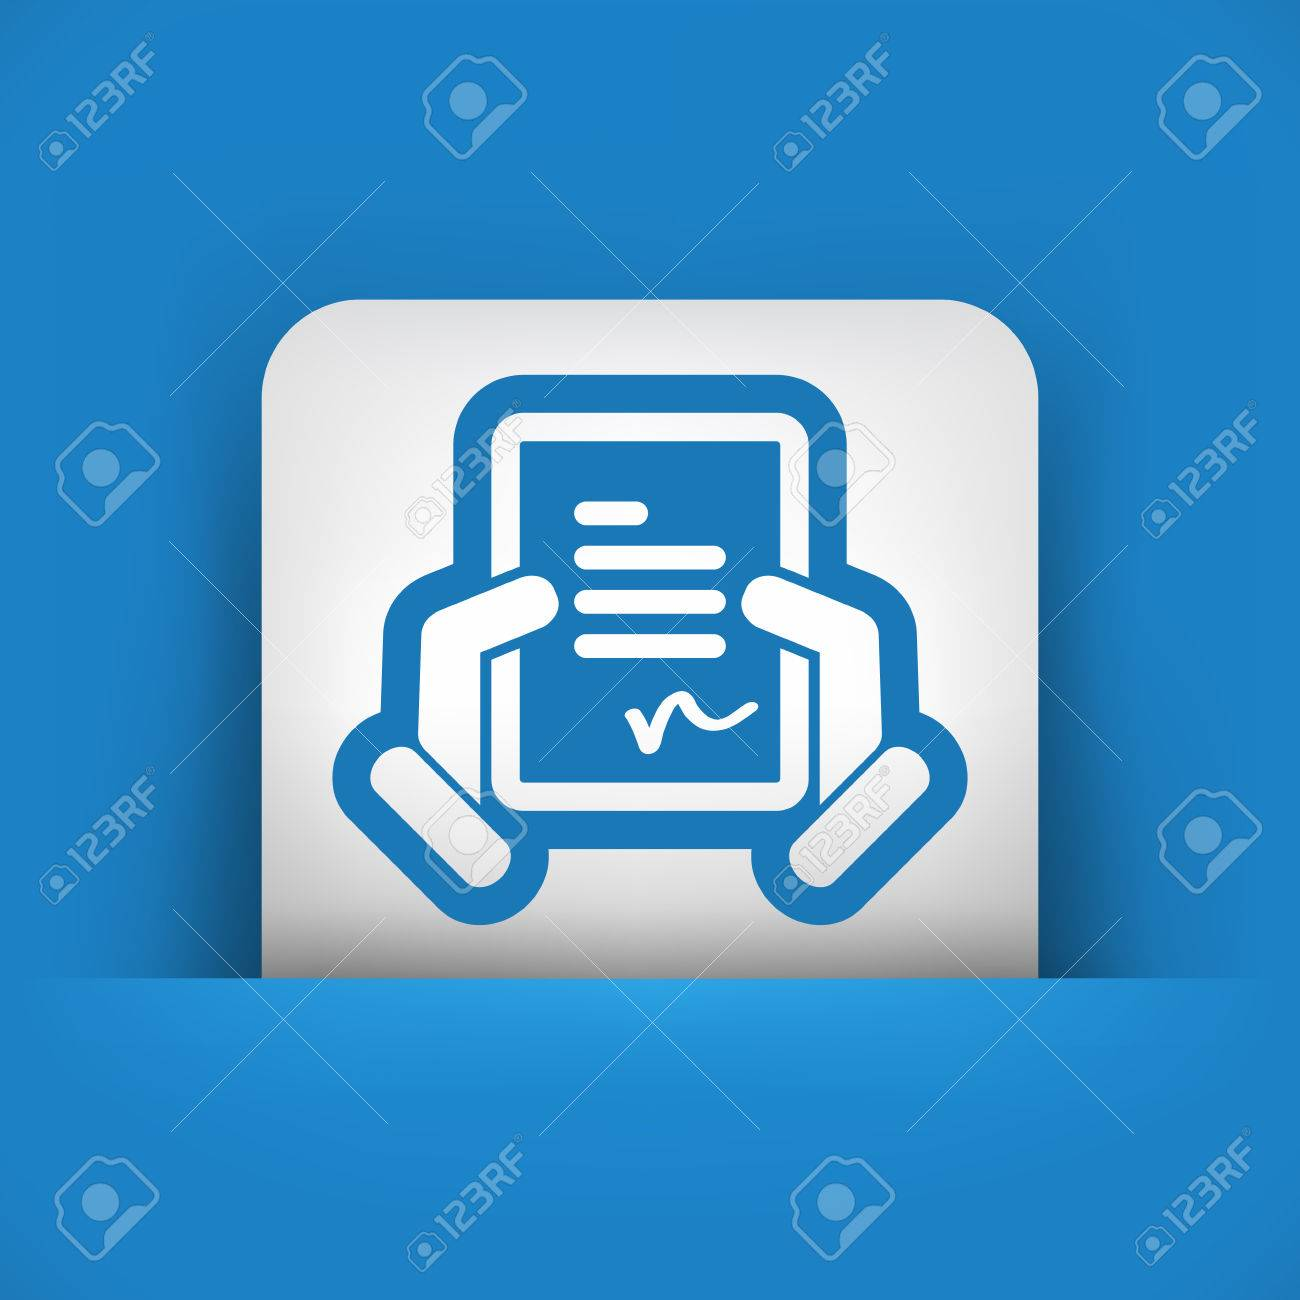 Document signature icon Stock Vector - 28281269